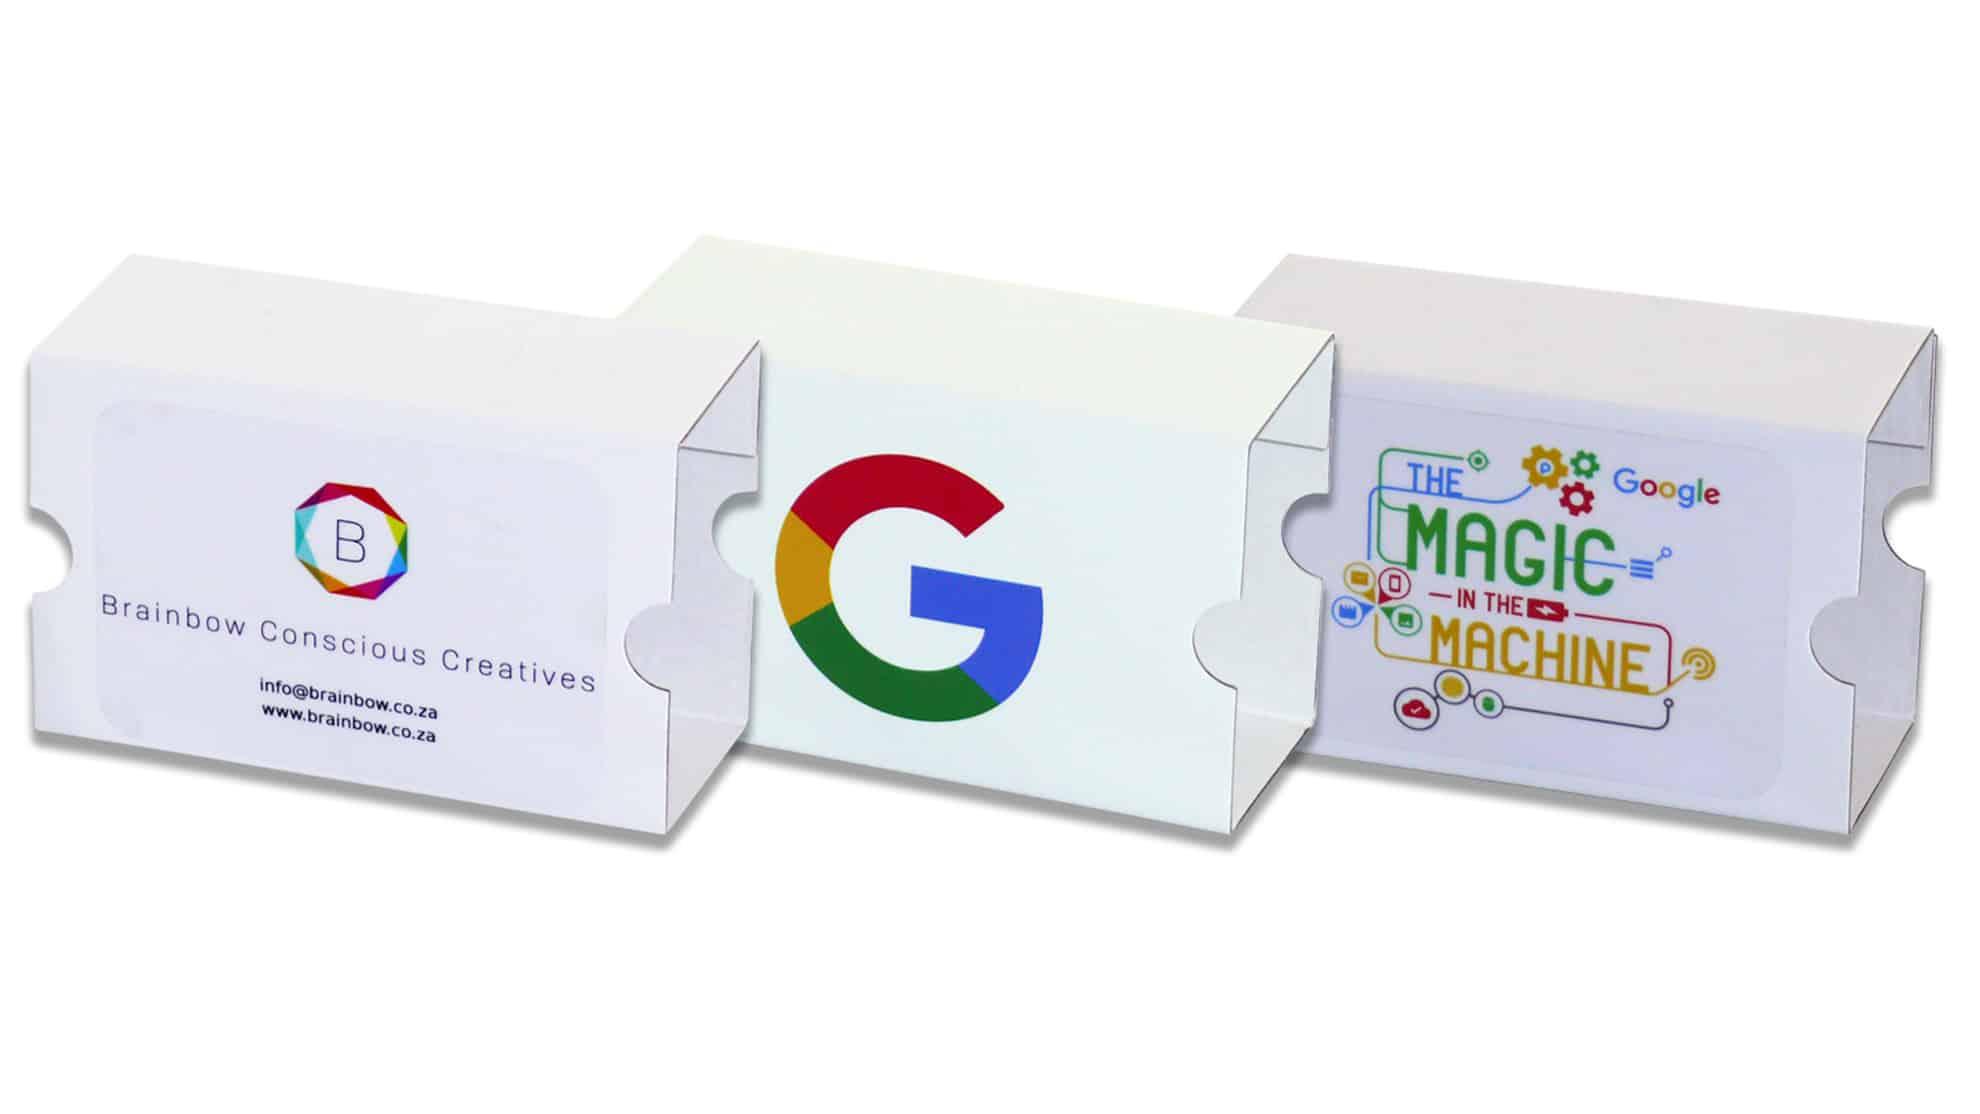 Custom Branded Google Cardboard Virtual Reality Headsets